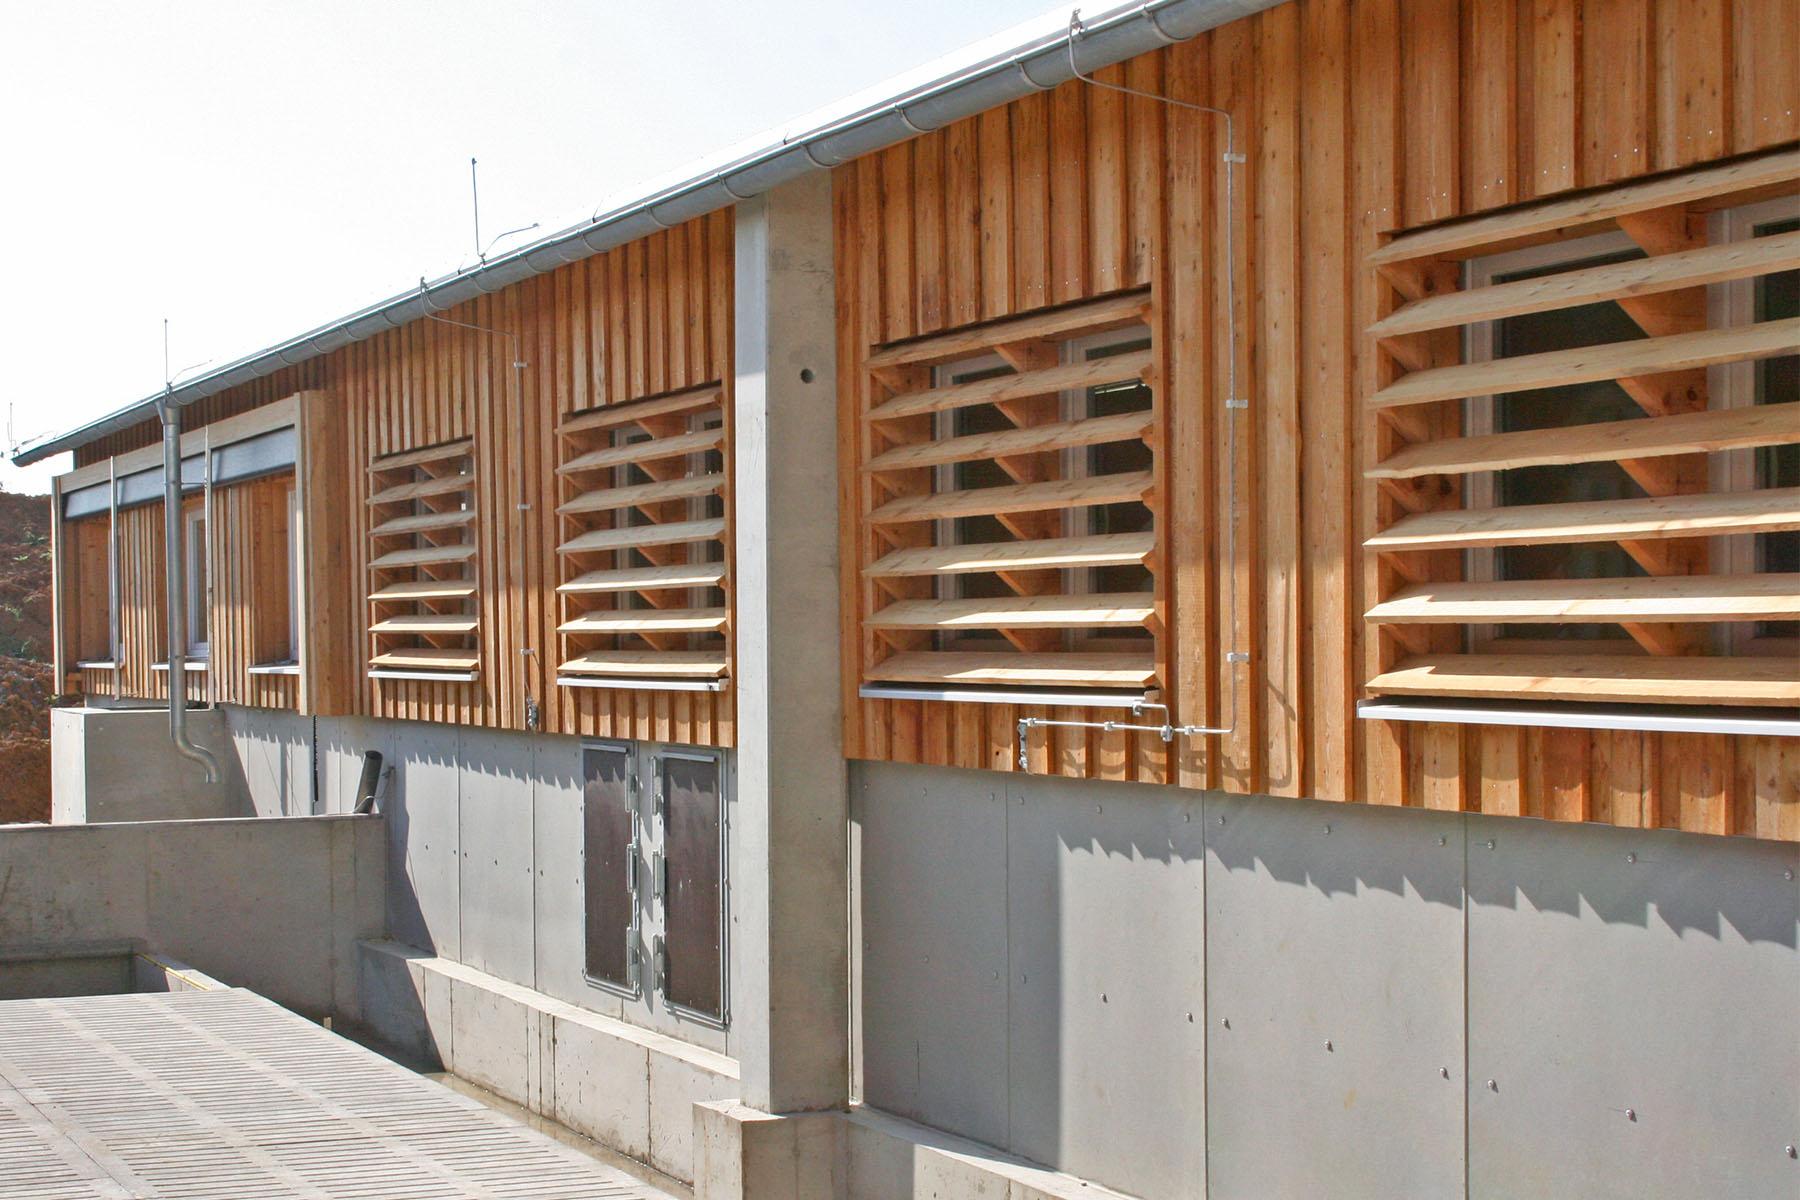 Holz Beton Wandkonstruktion